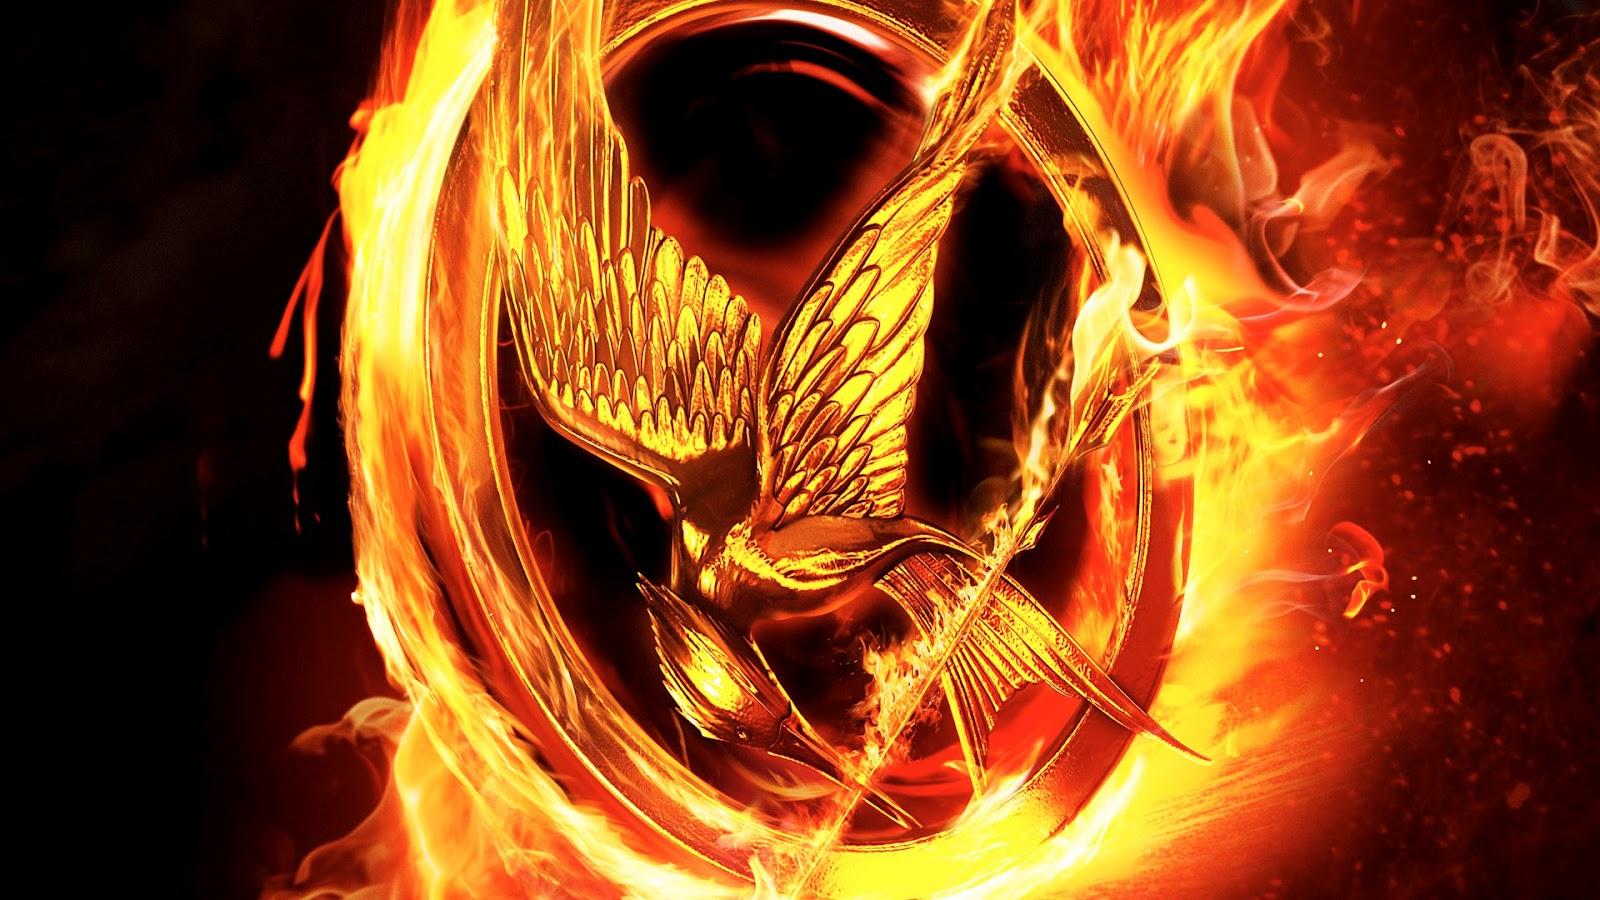 The Hunger Games wallpaper 11